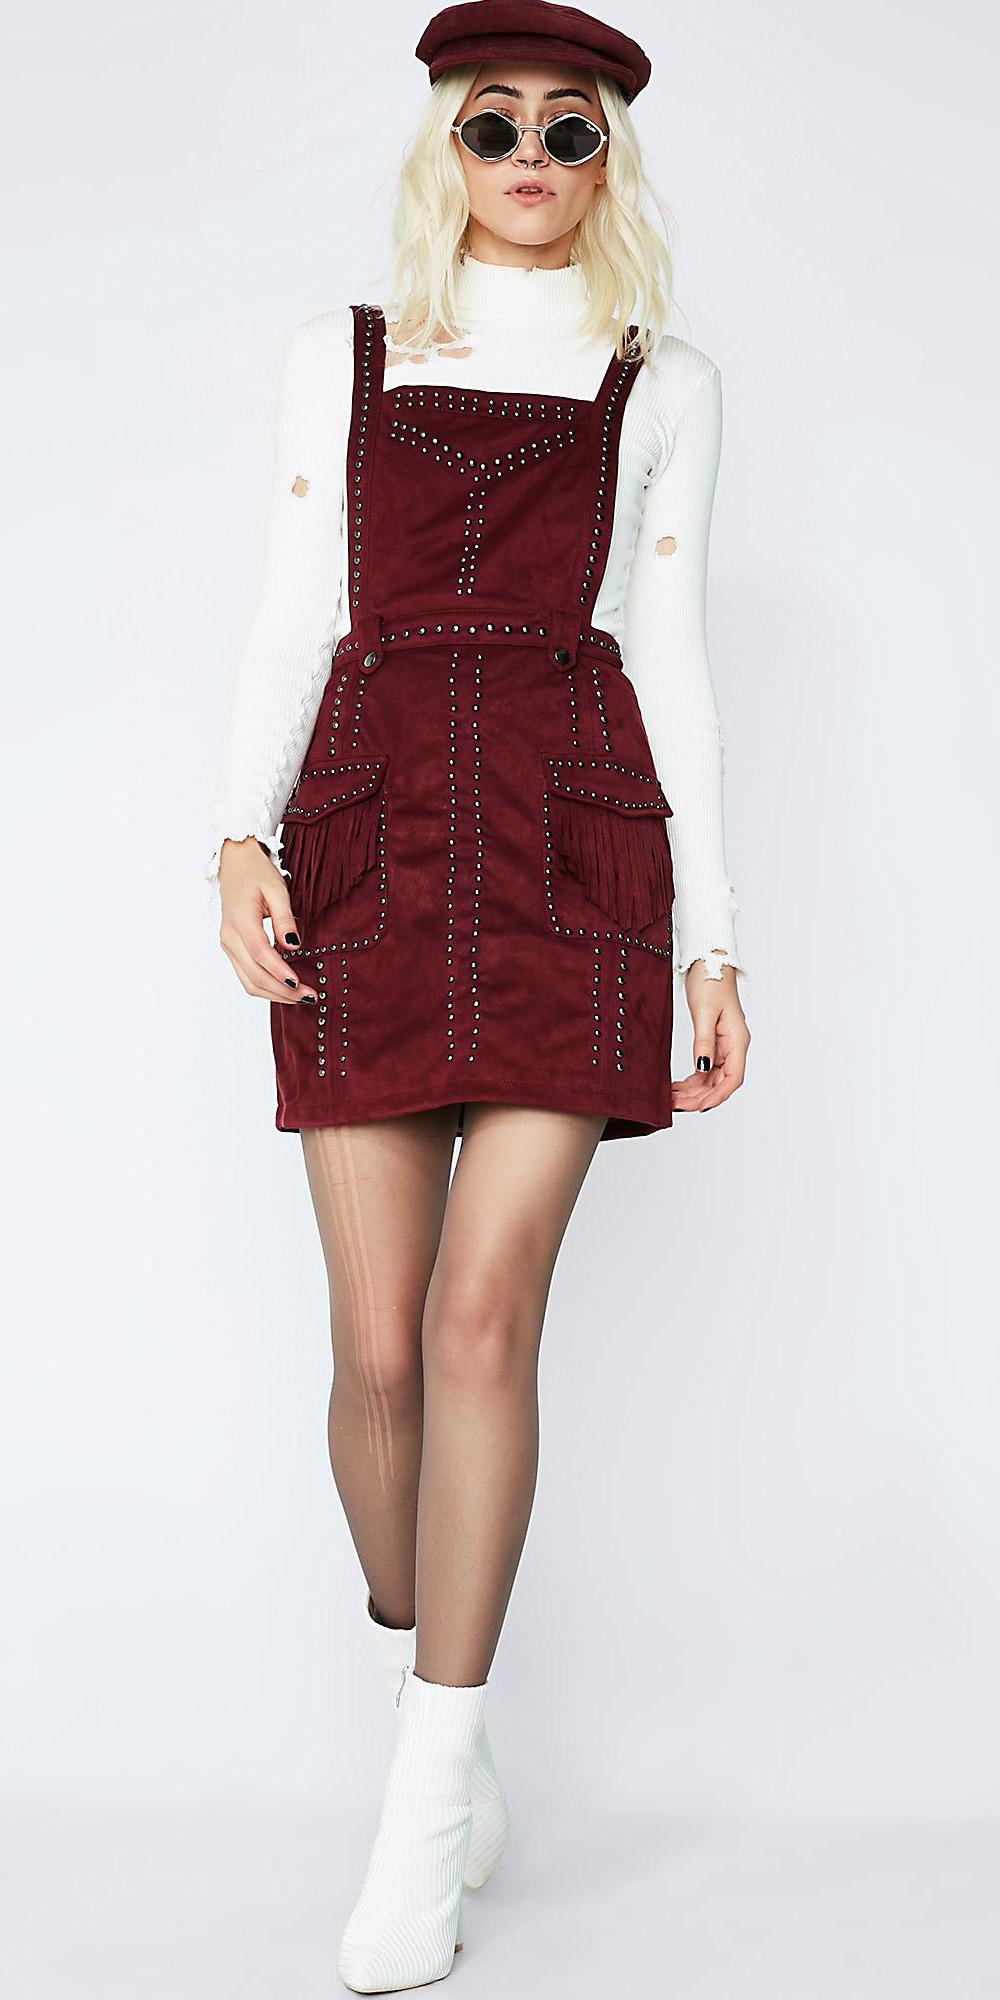 burgundy-dress-jumper-white-sweater-turtleneck-white-shoe-booties-blonde-lob-sun-hat-fall-winter-lunch.jpg